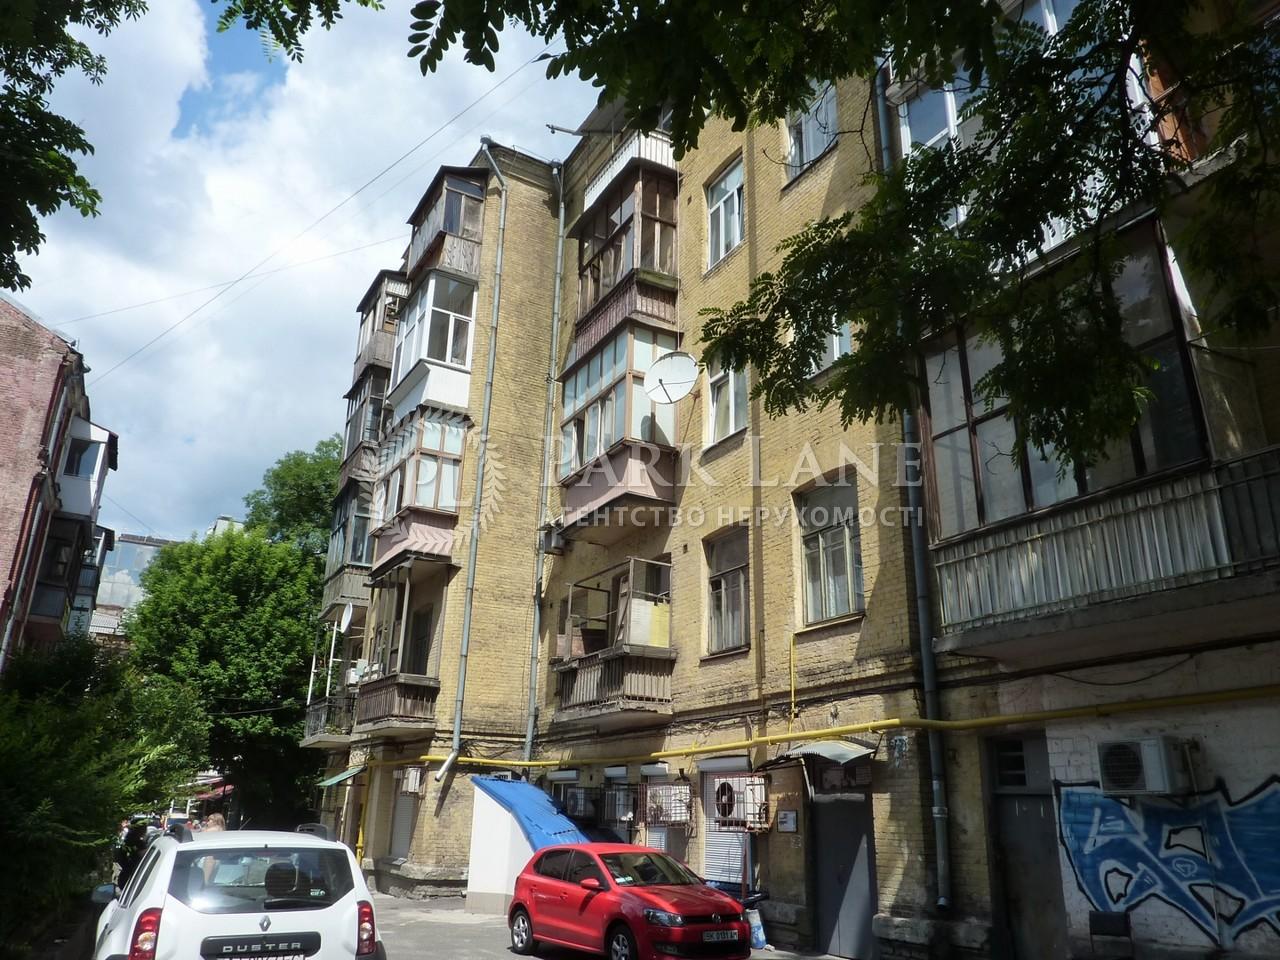 Квартира Z-42149, Сечевых Стрельцов (Артема), 7, Киев - Фото 1